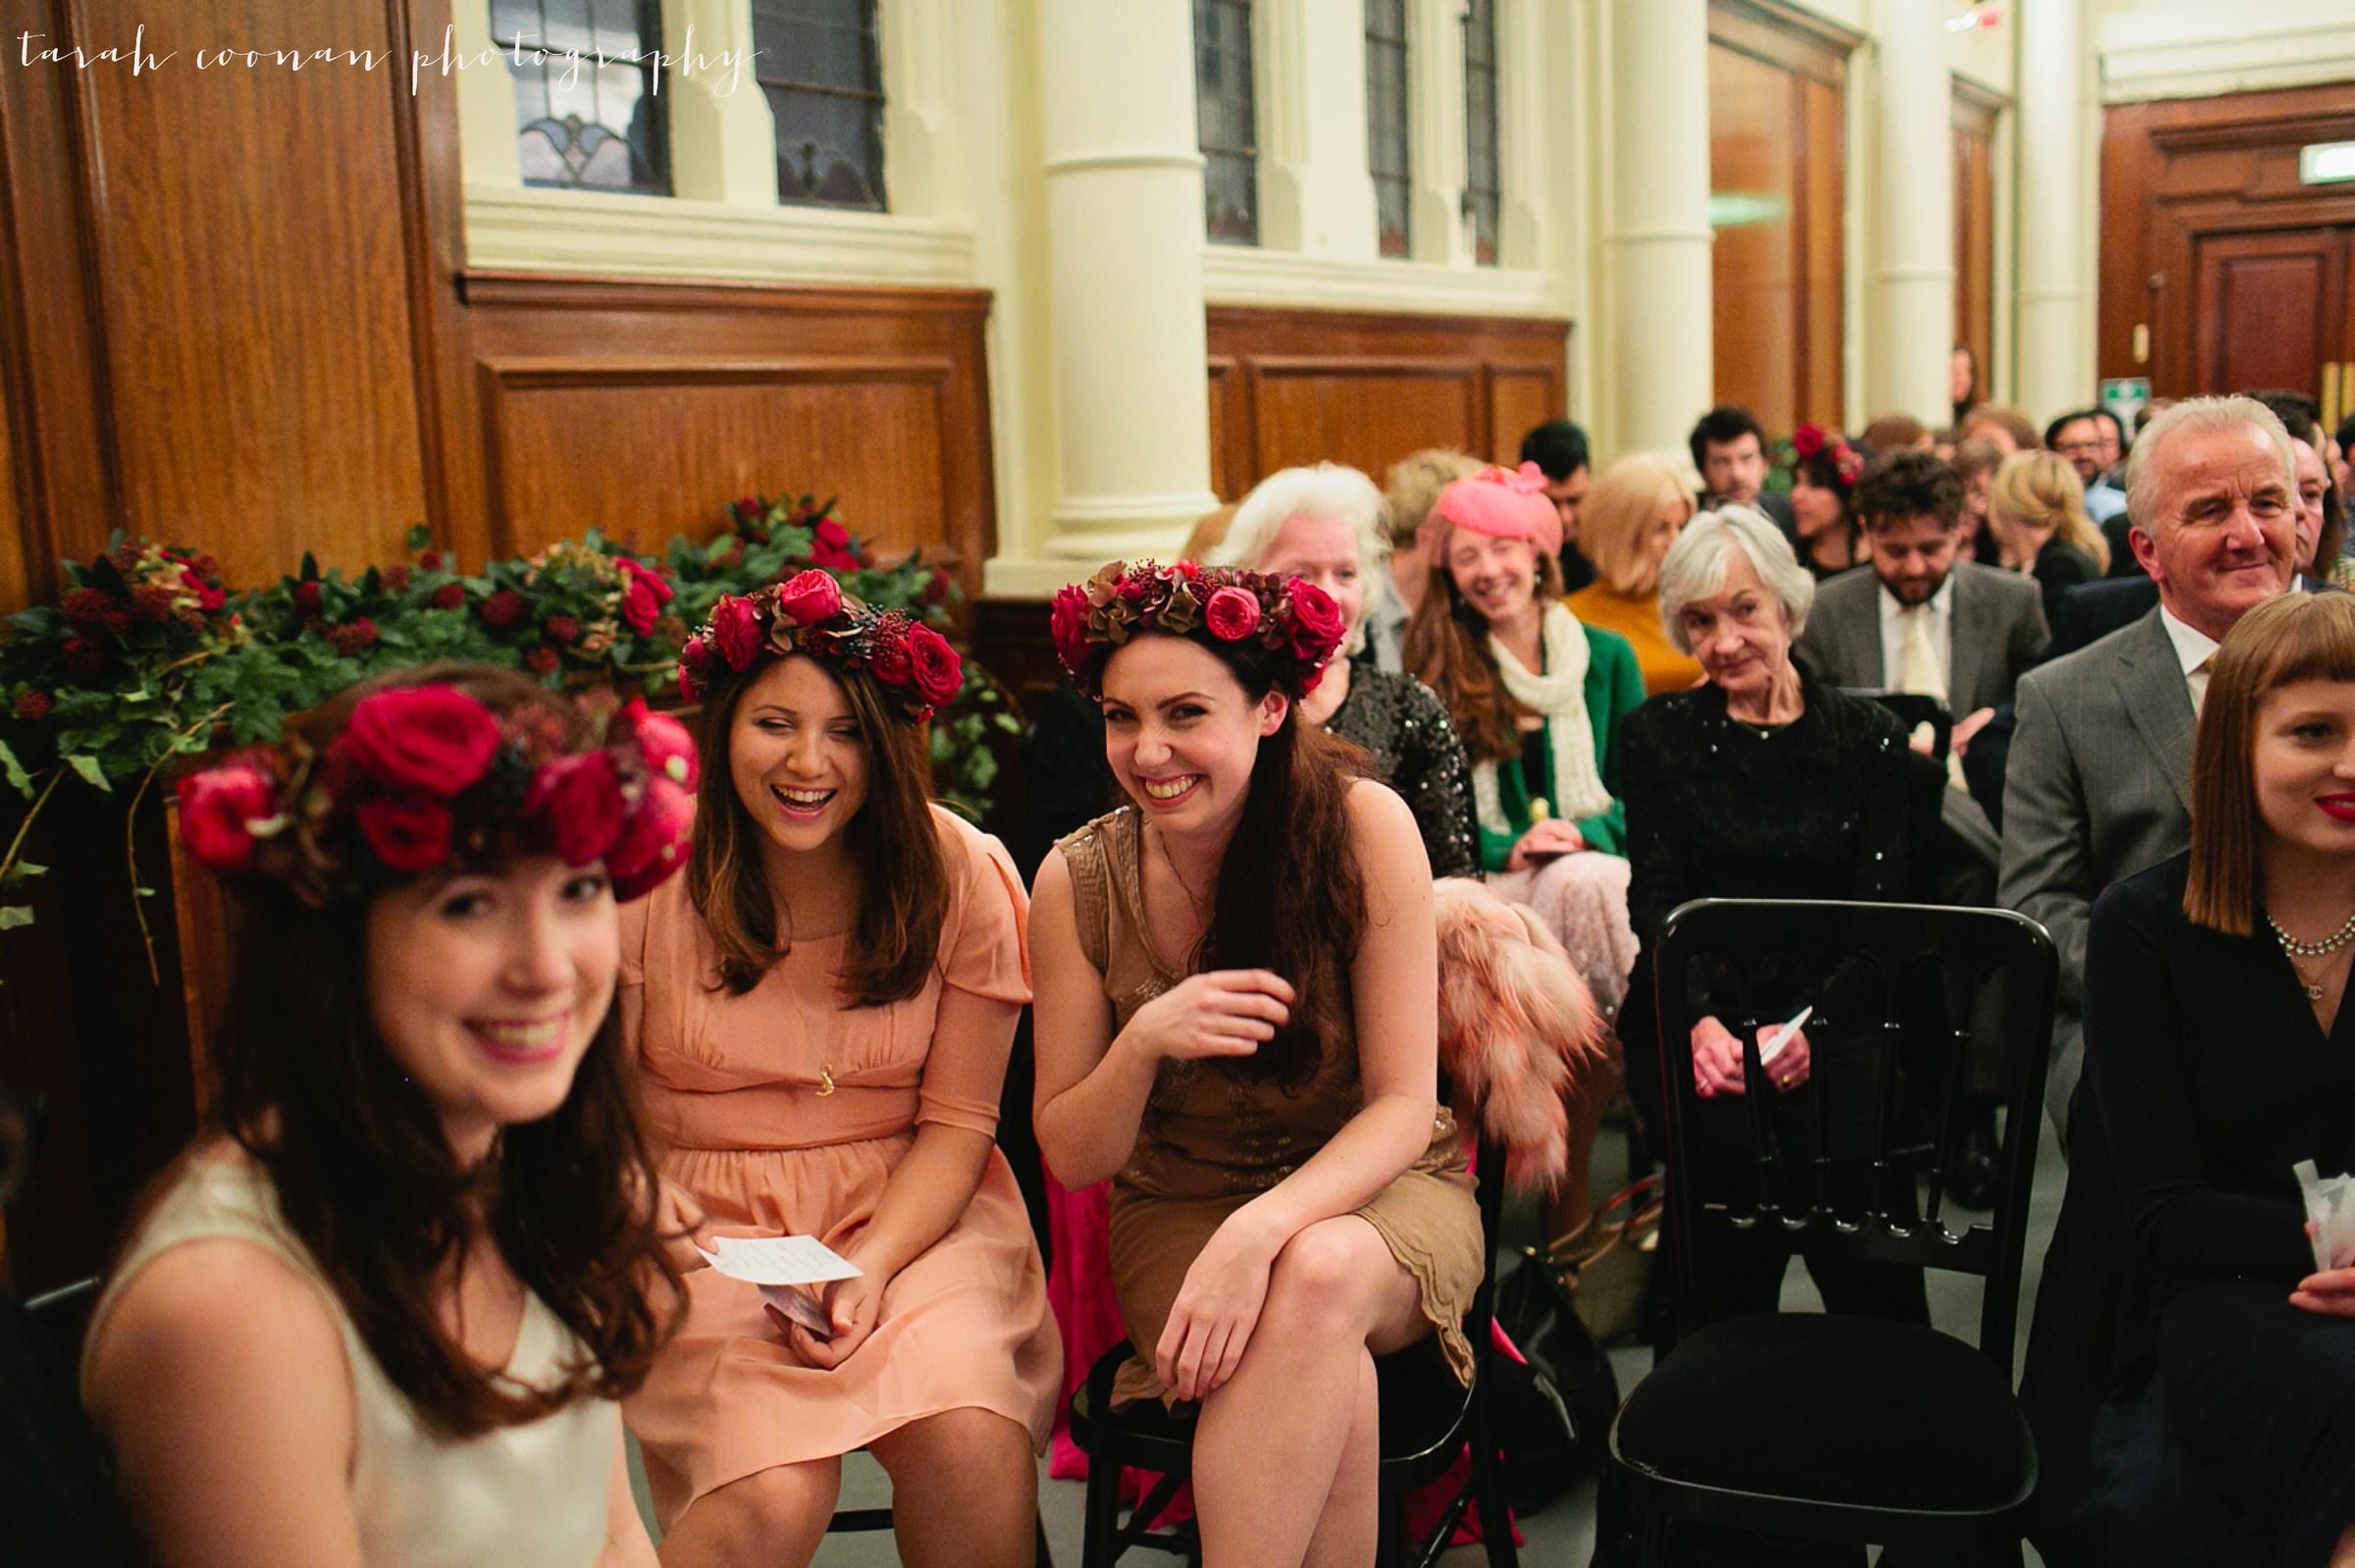 brighton-wedding-photographer18